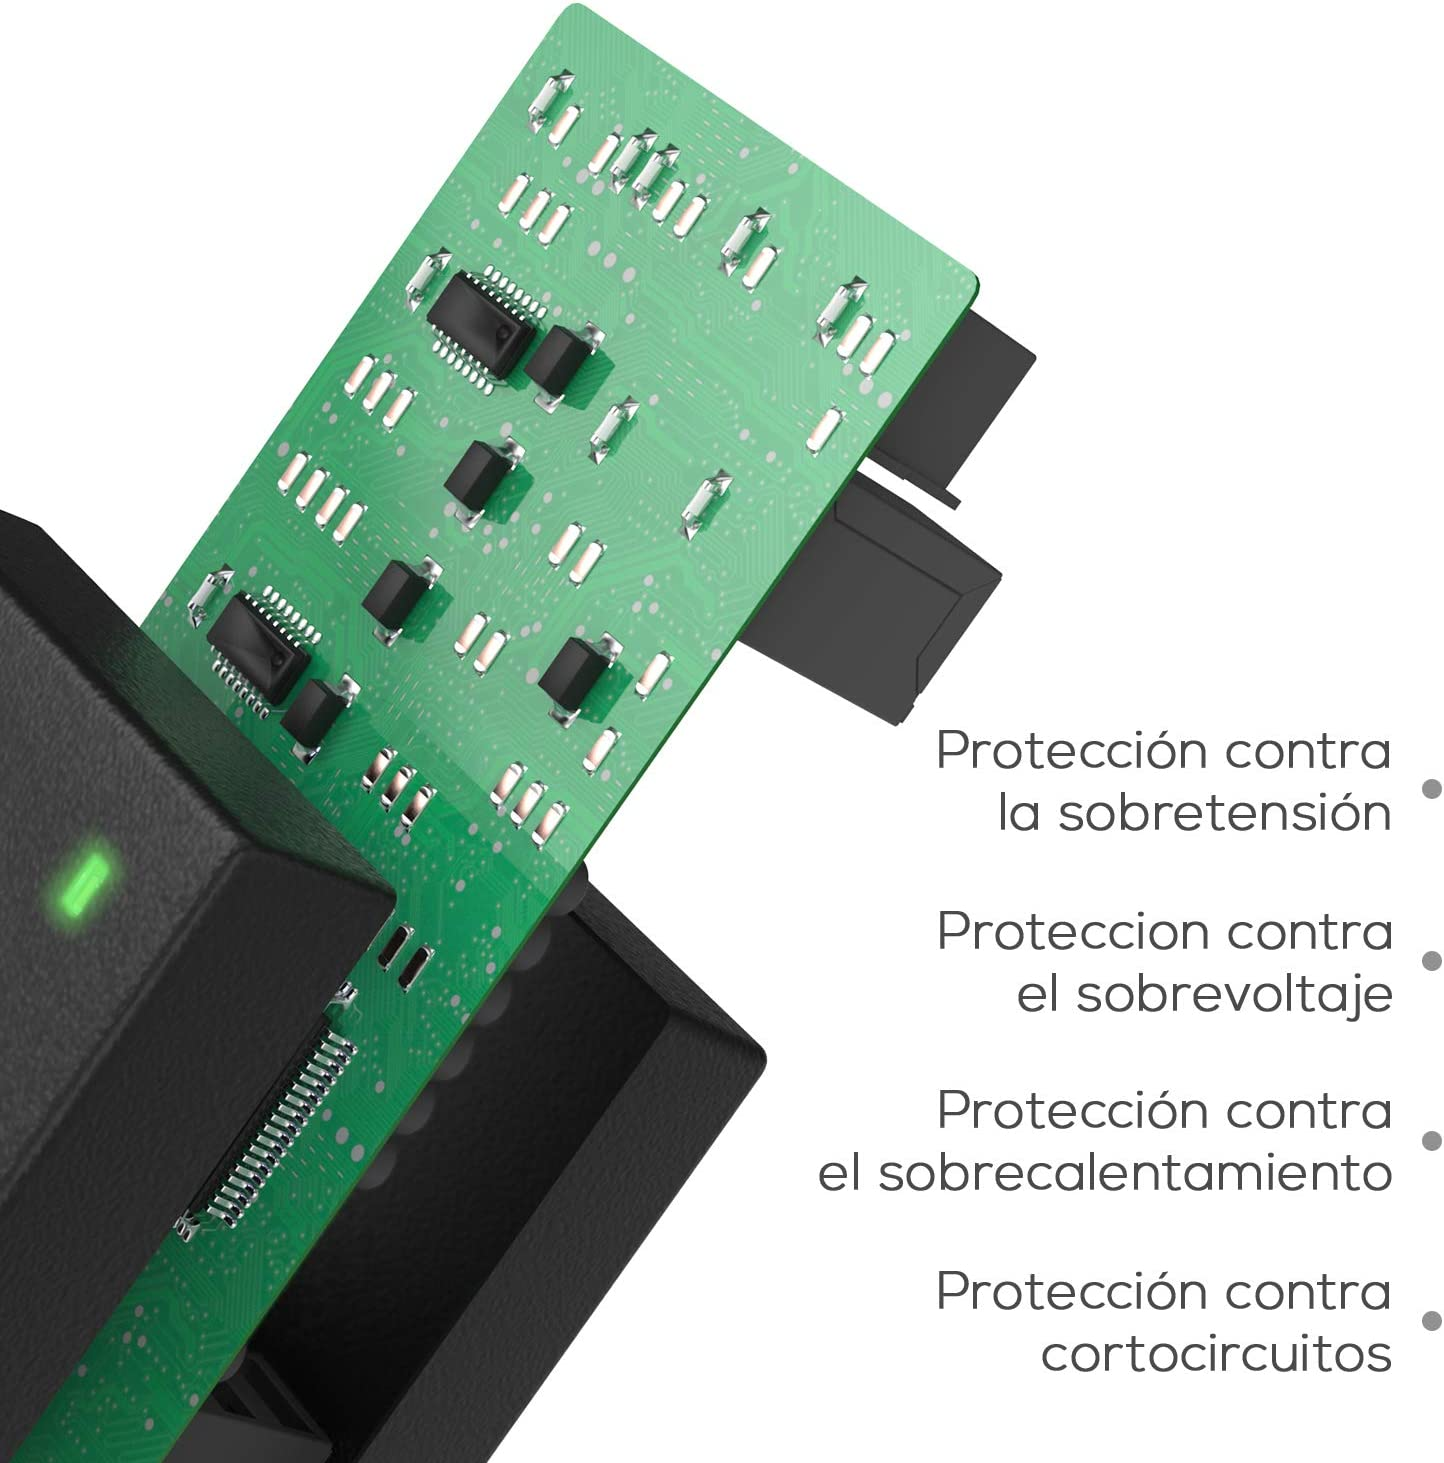 Adaptador per Lenovo Thinkpad Edge 11 13 14 15 Serie B490 B590 T400 T410 T420 T420s T430 T430s T500 T510 T520 T530 T61 X201 X201s X220 X220t X230 X301 X61 Lavolta 90W 65W 40W Cargador 7.9 x 5.5 mm